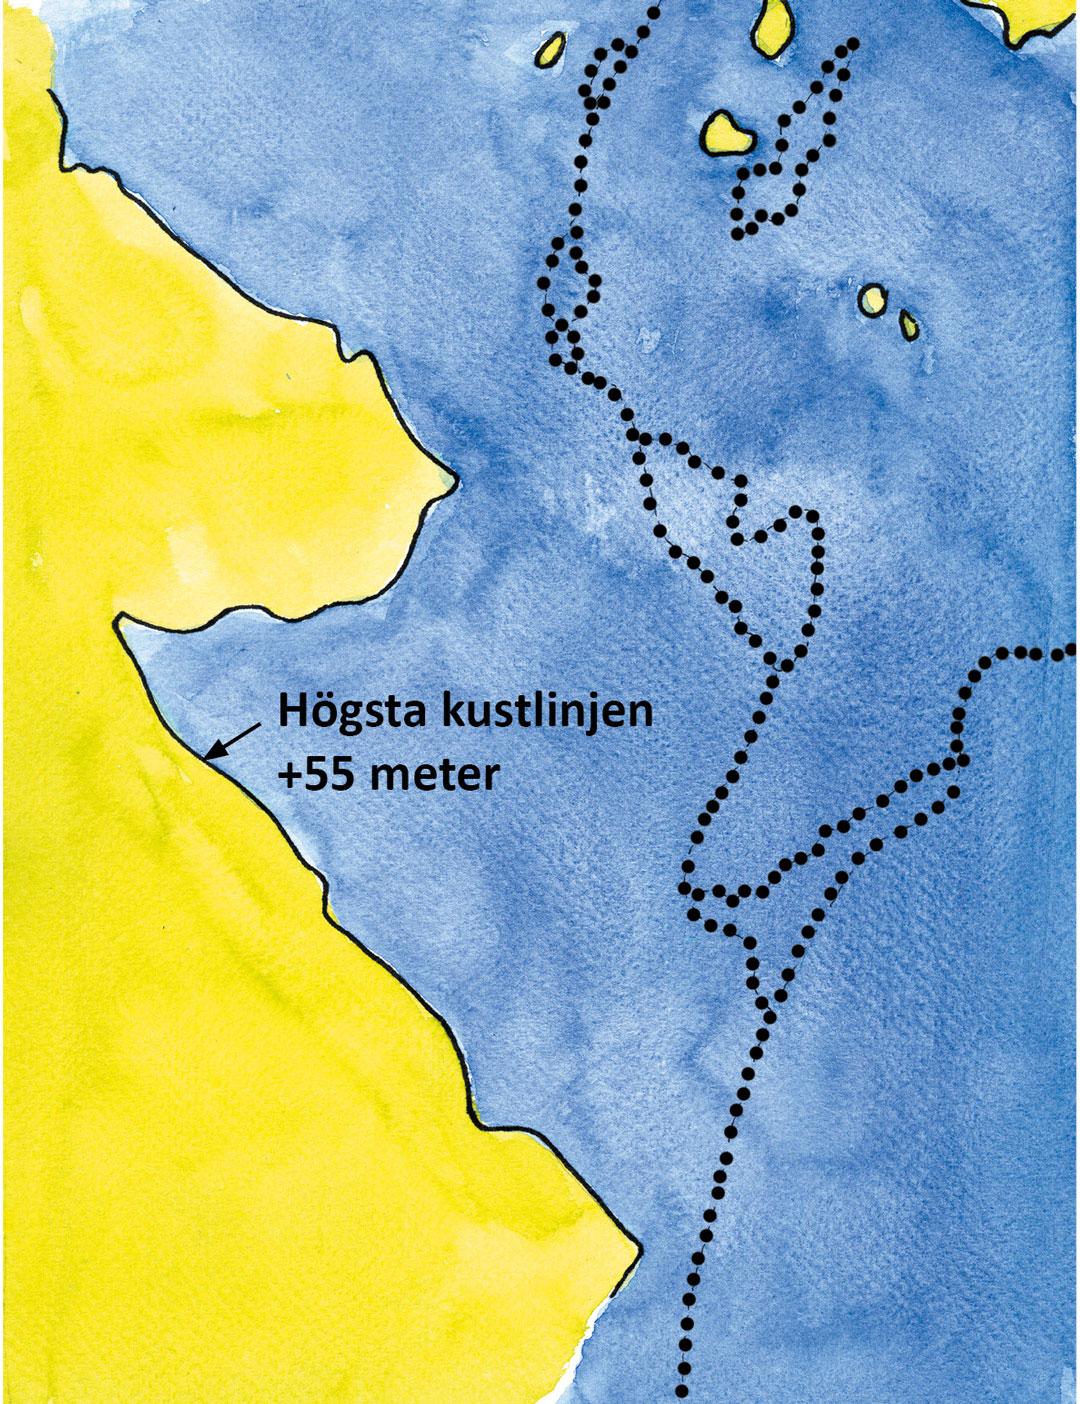 Baltiska issjön geologi